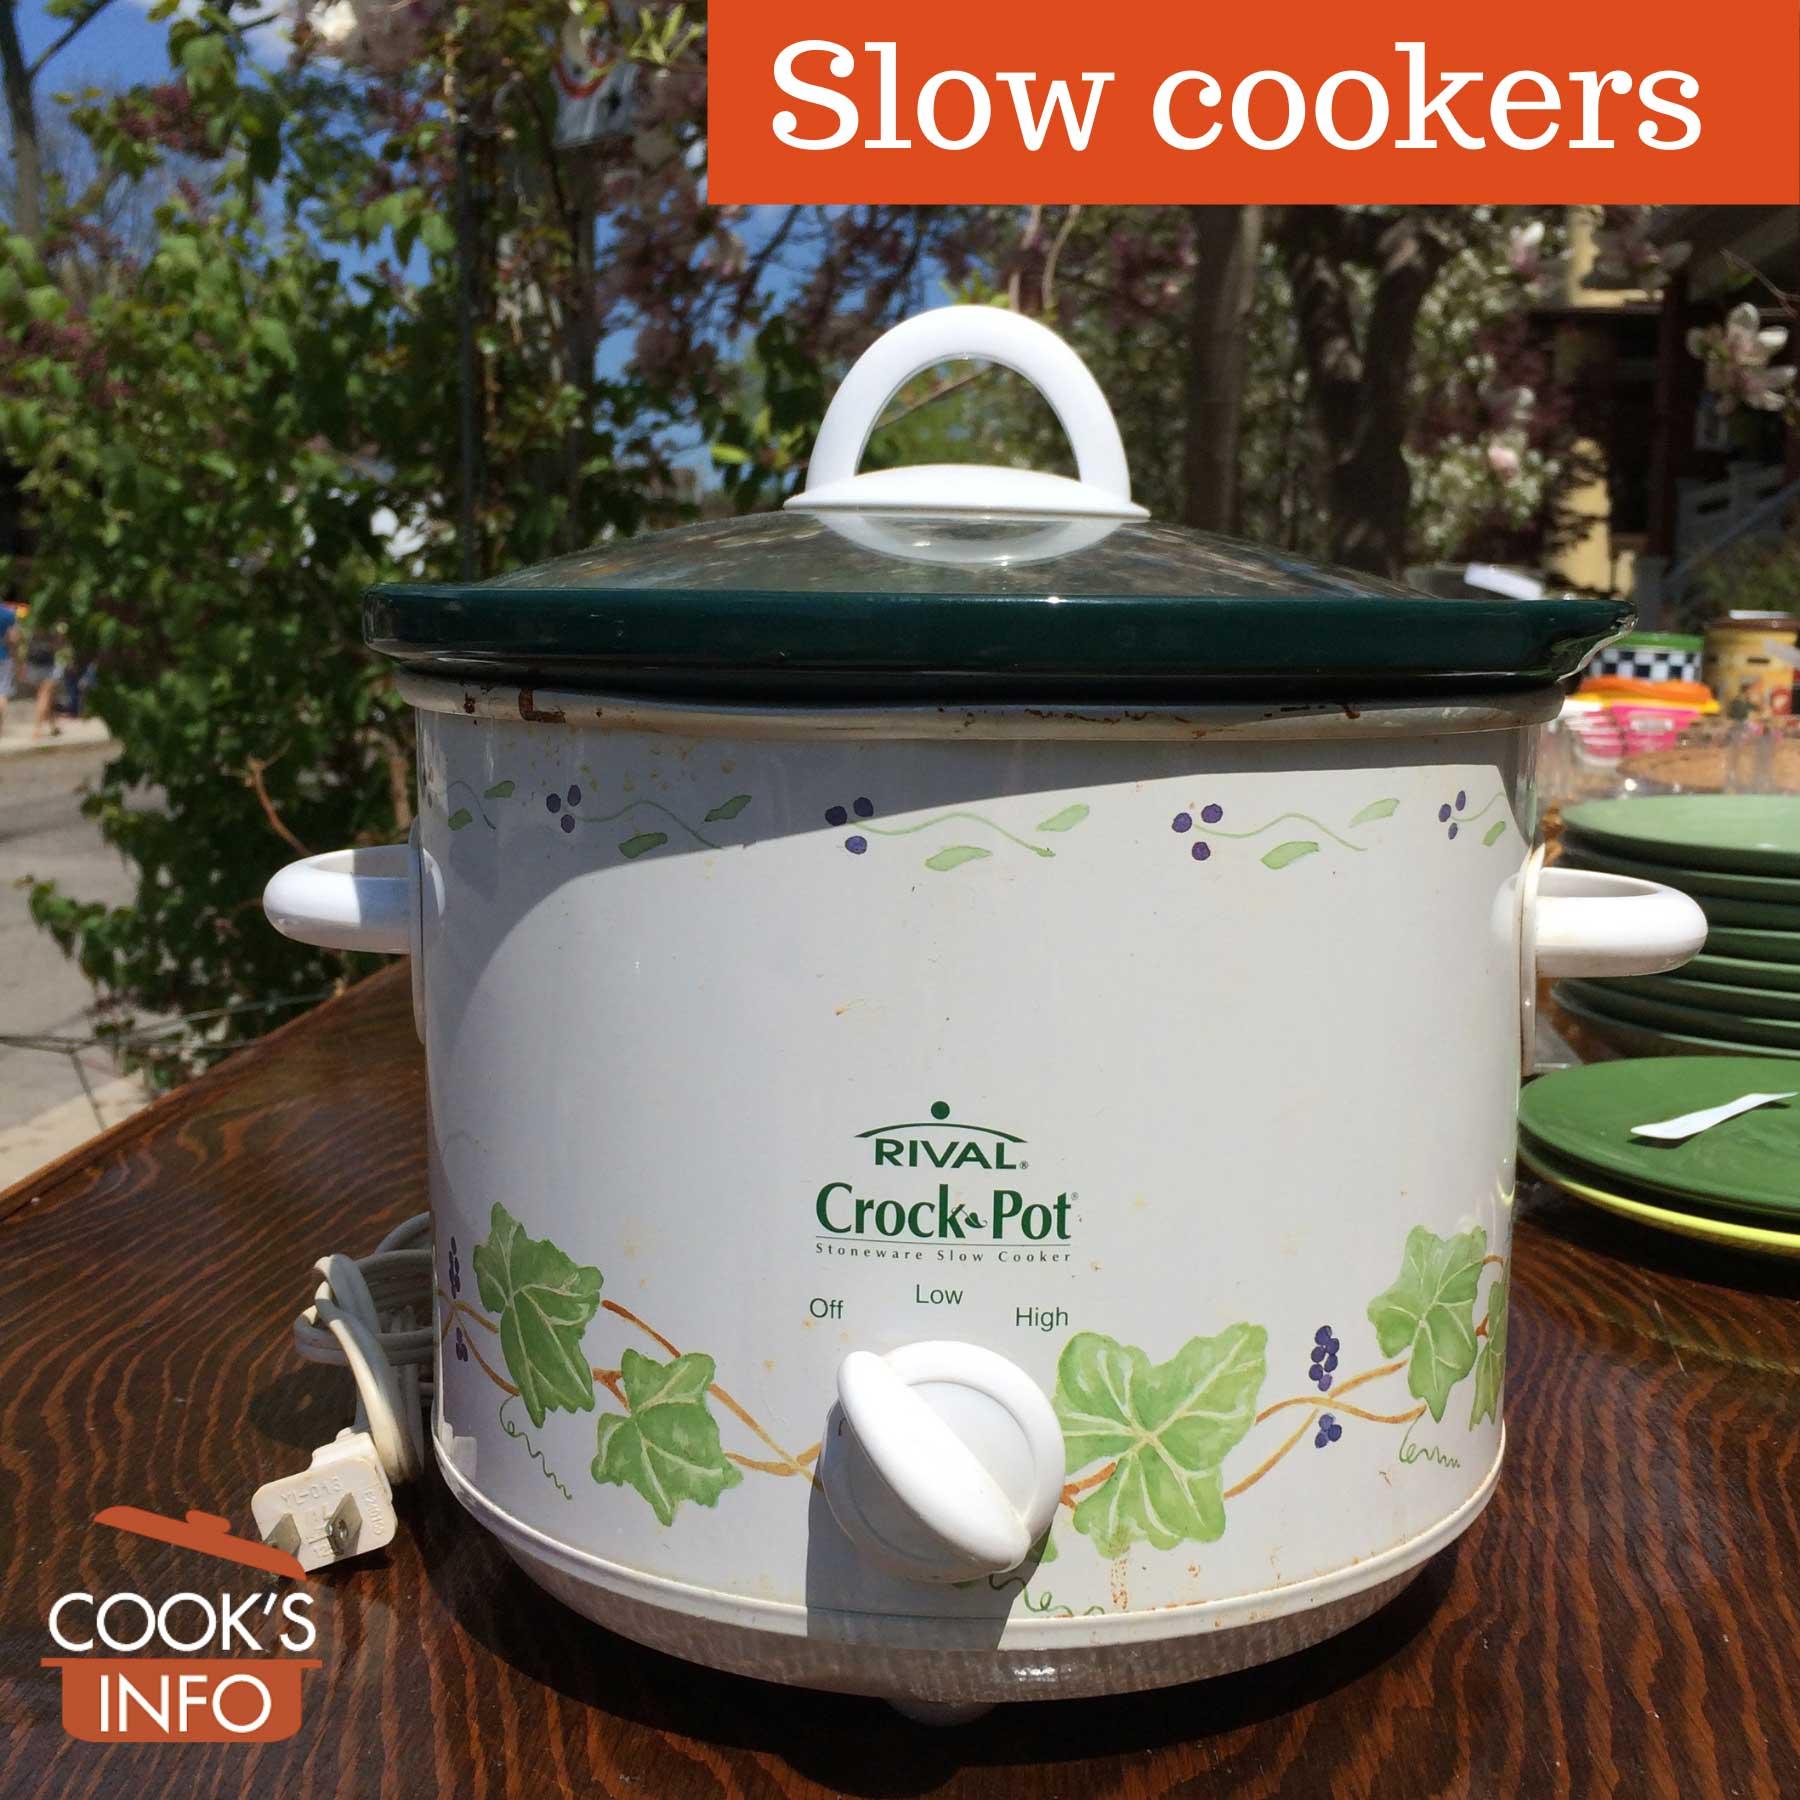 Slow cooker crock pot model